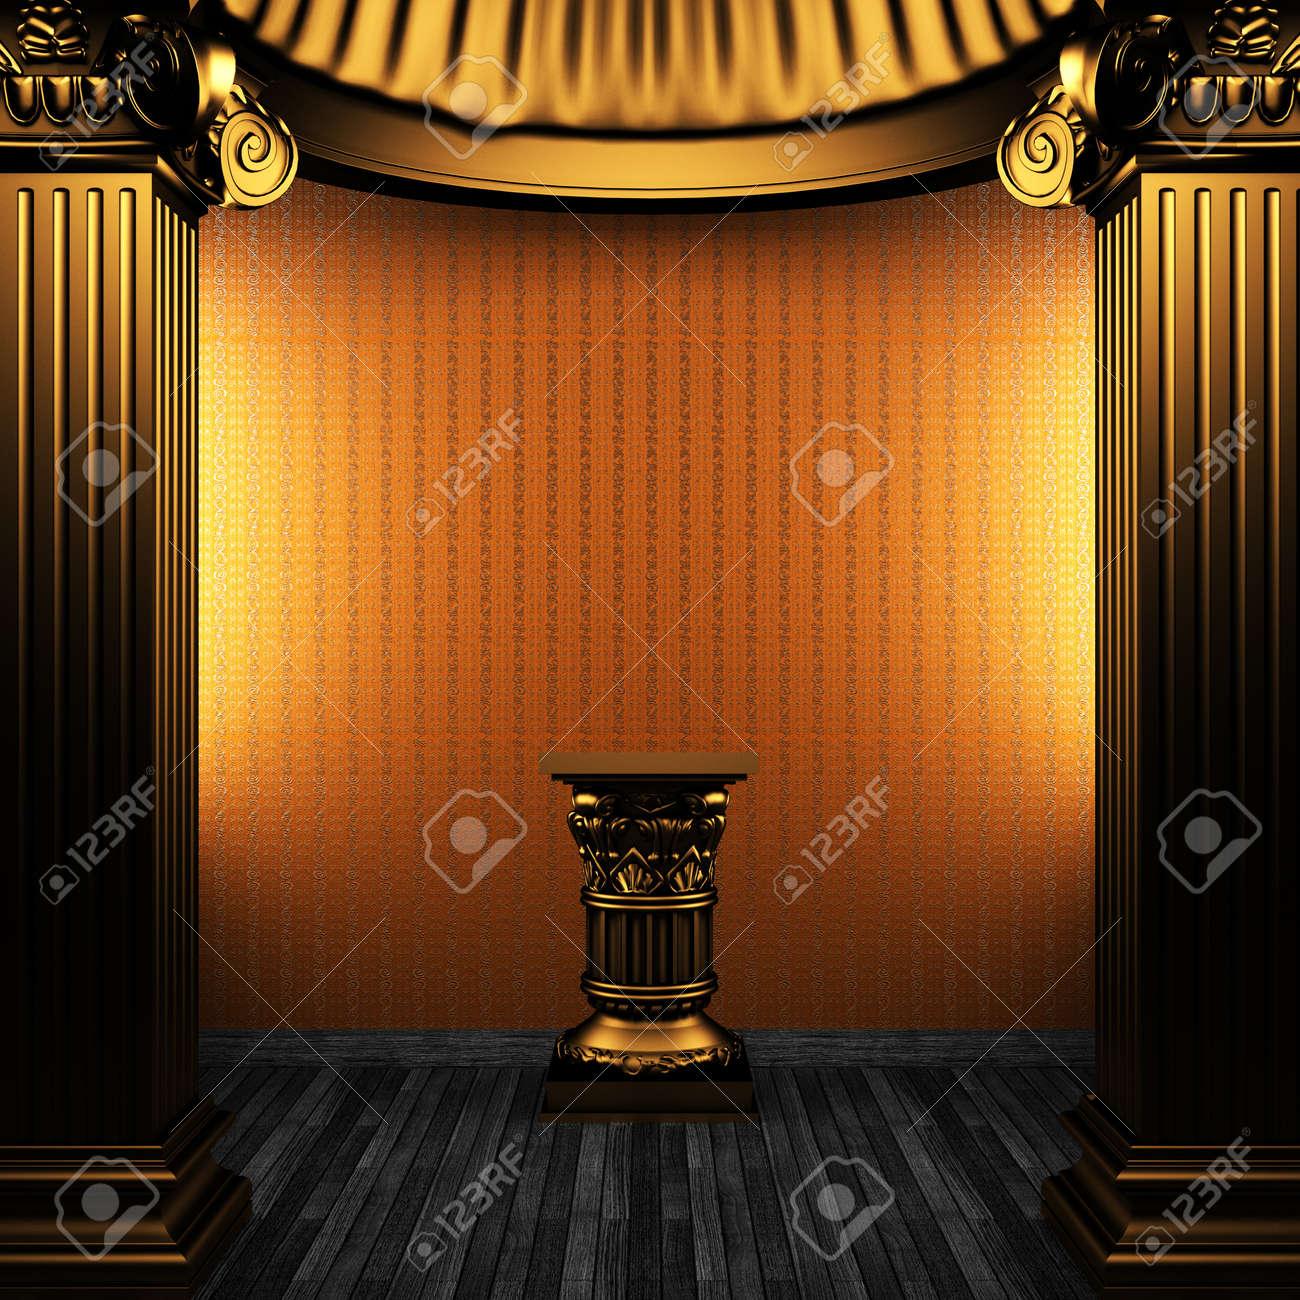 bronze columns, pedestal and wallpaper made in 3D Stock Photo - 8471270